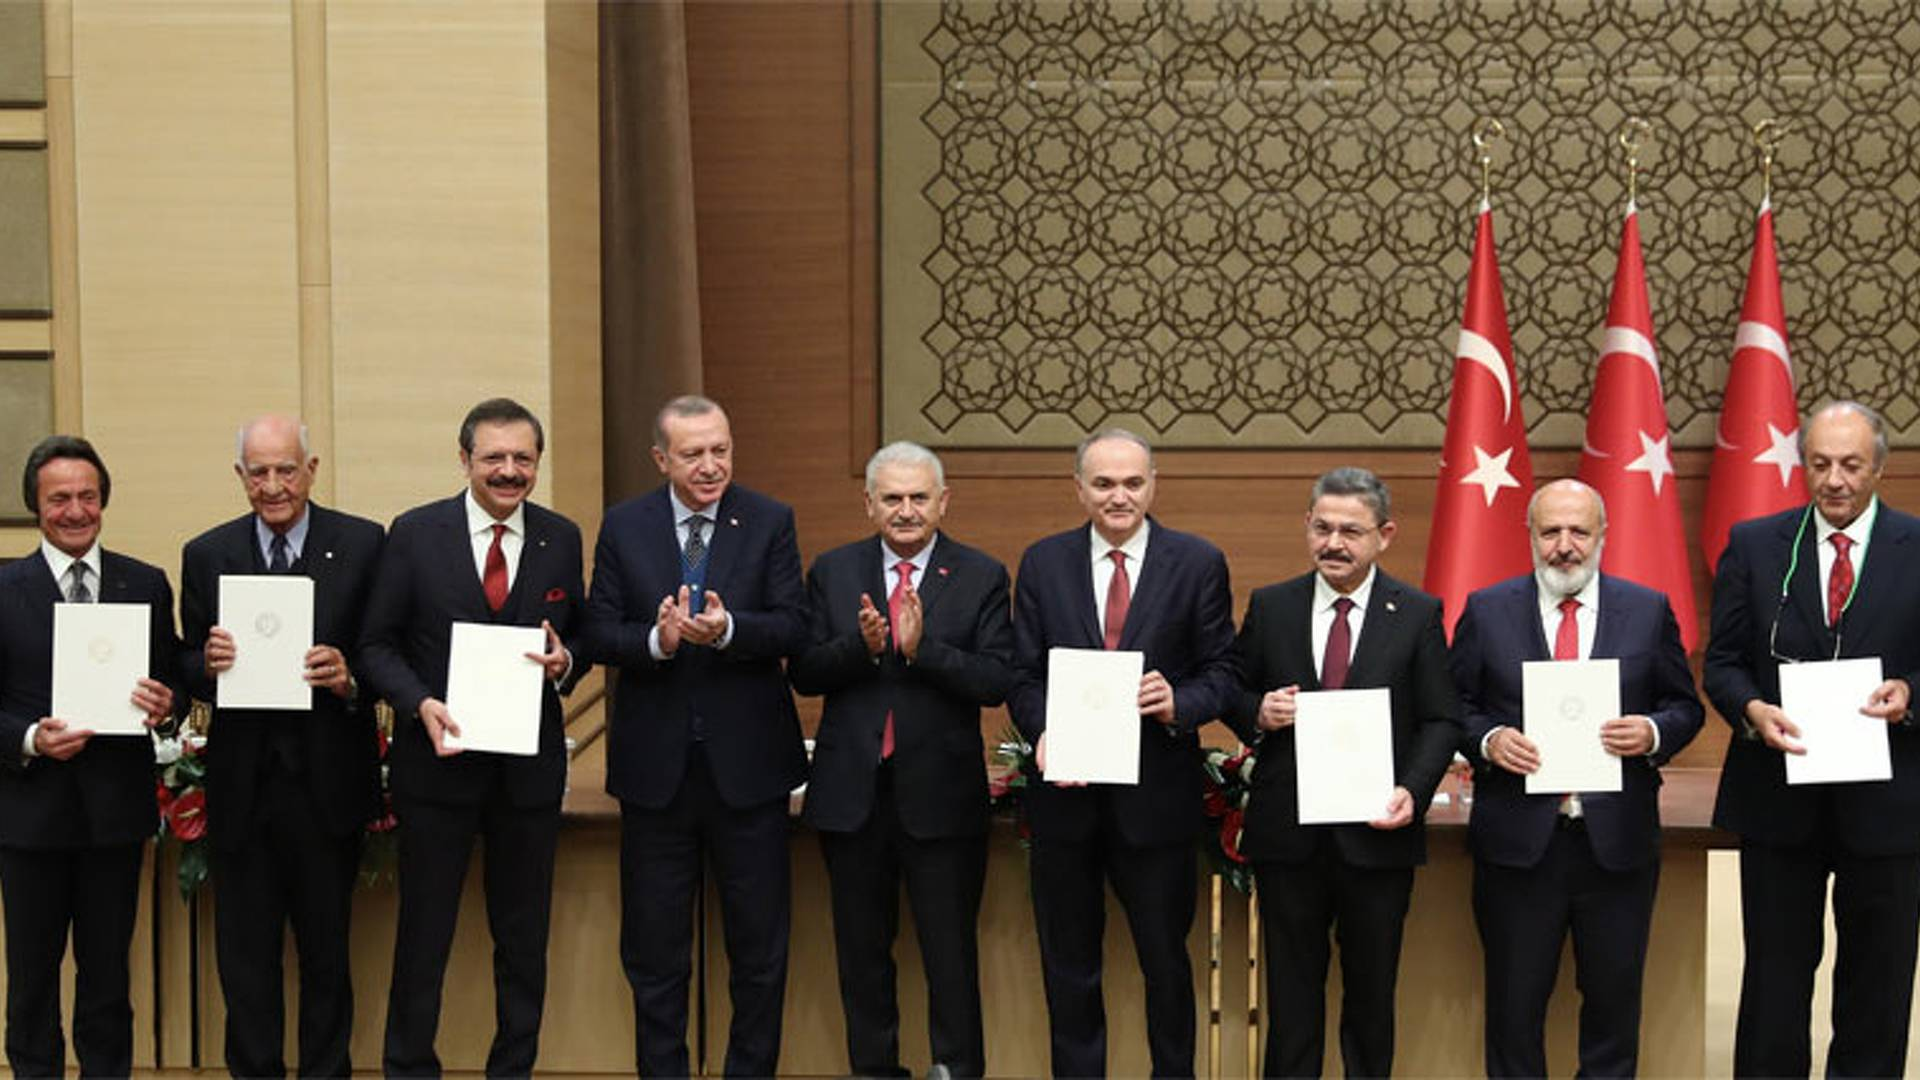 """YERLİ OTOMOBİL"" YUTTURMACASI VE PALAVRA POLİTİKASI"